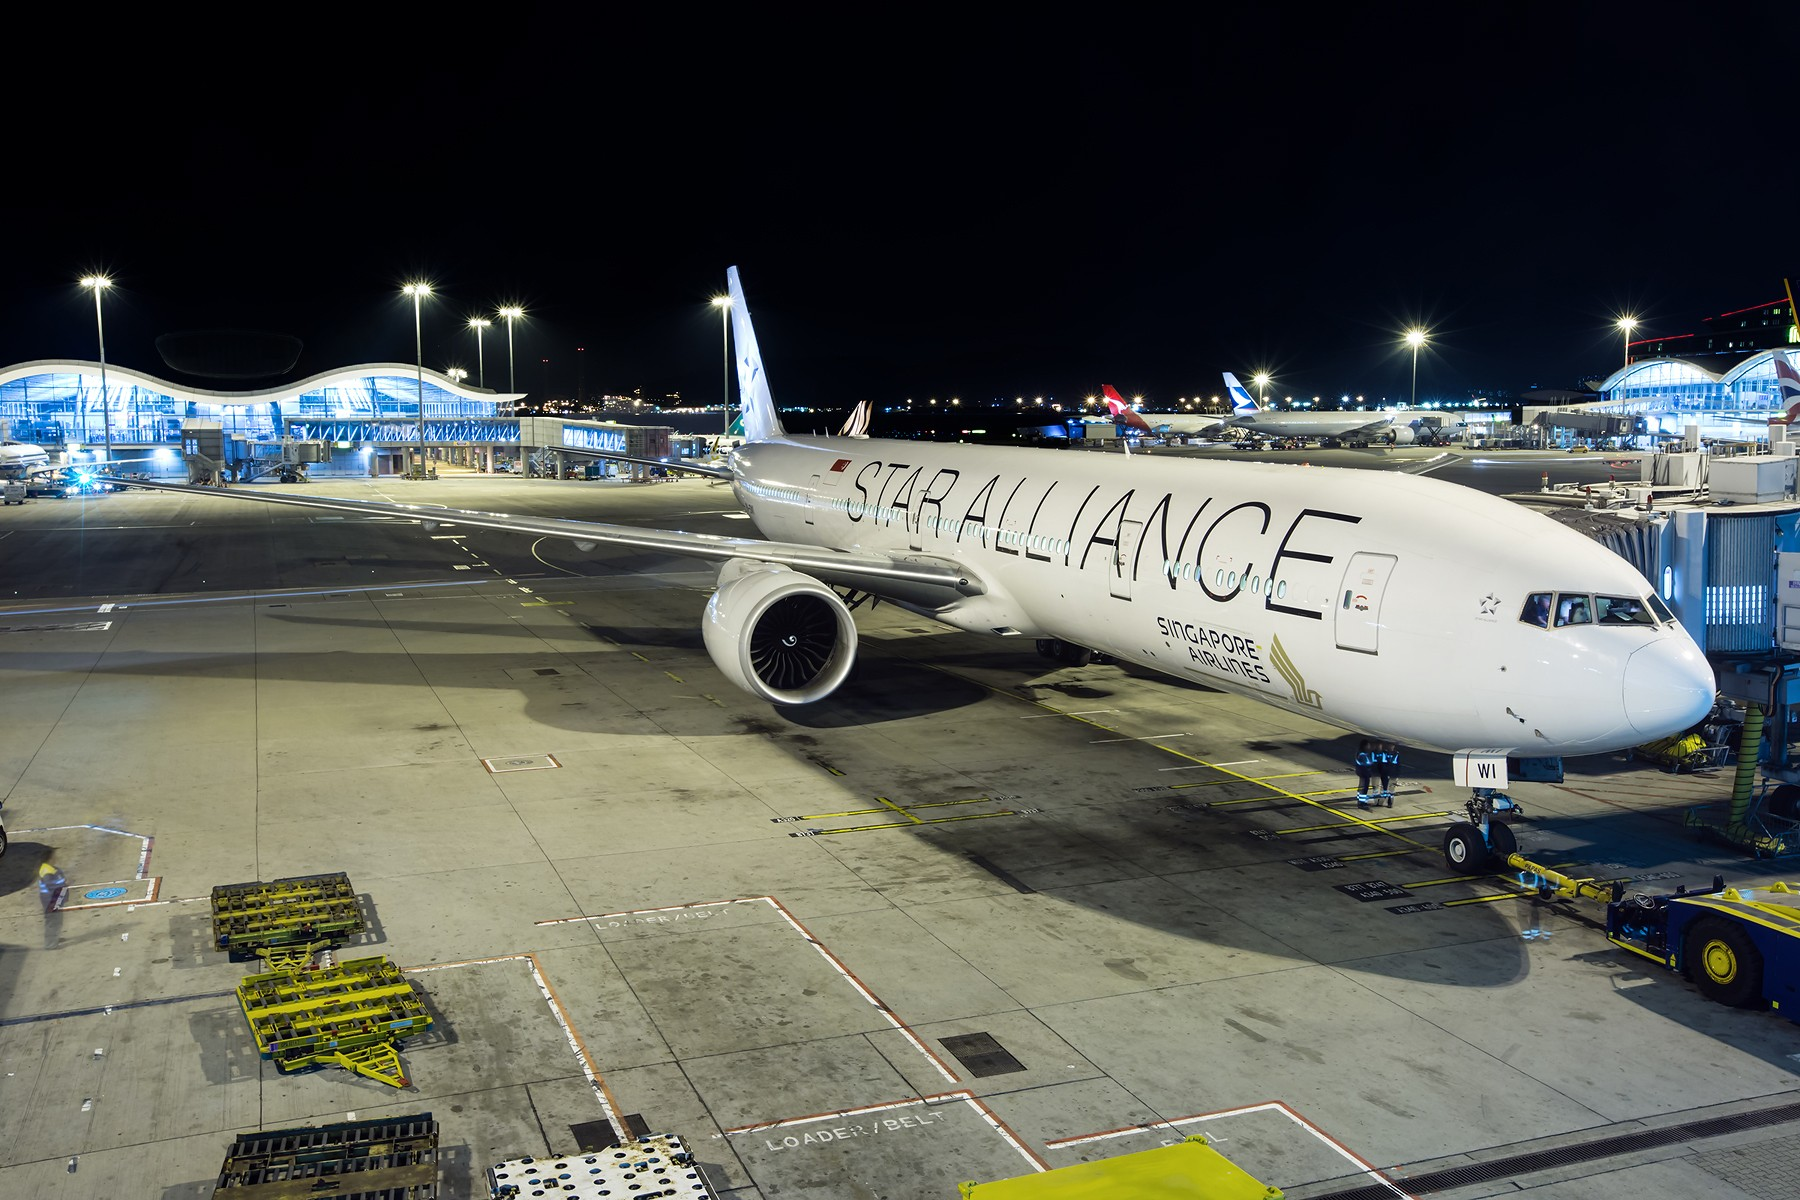 Re:[原创]夜太美 BOEING 777-300ER 9V-SWI 中国香港赤鱲角国际机场